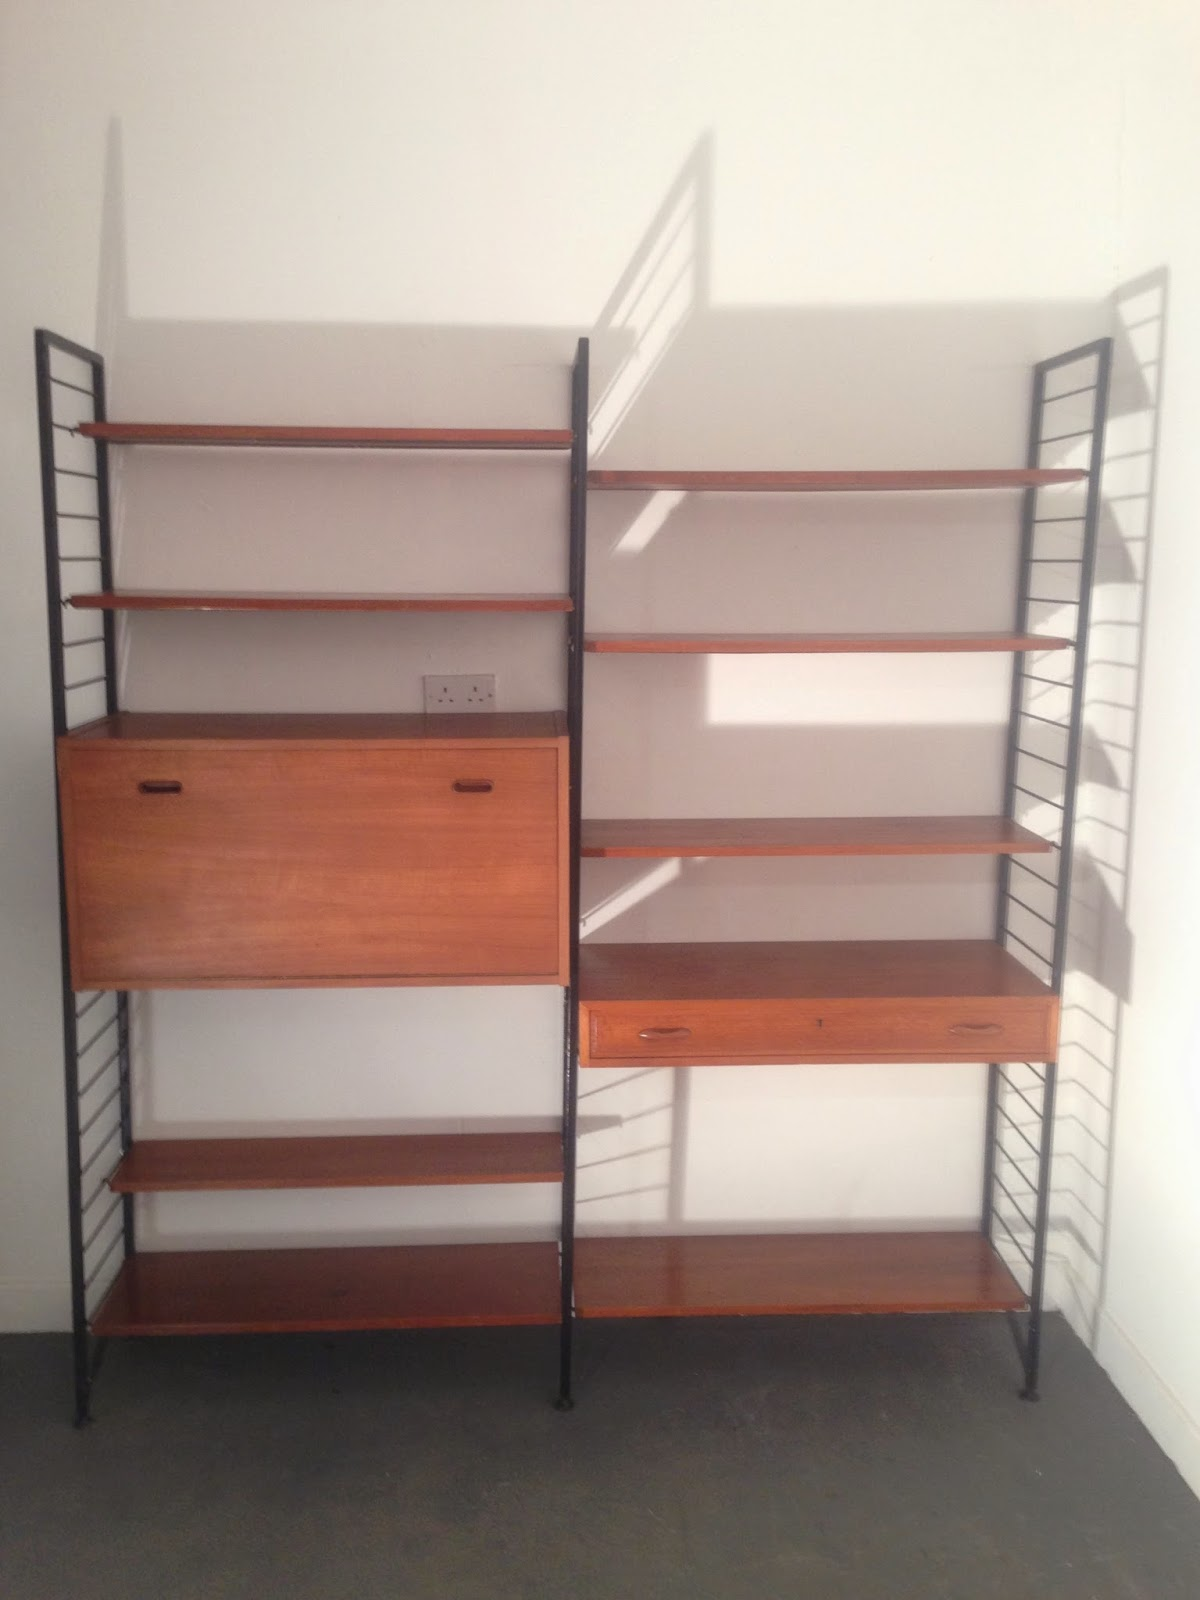 Ocd vintage furniture ireland ladderax shelving unit for Furniture ireland